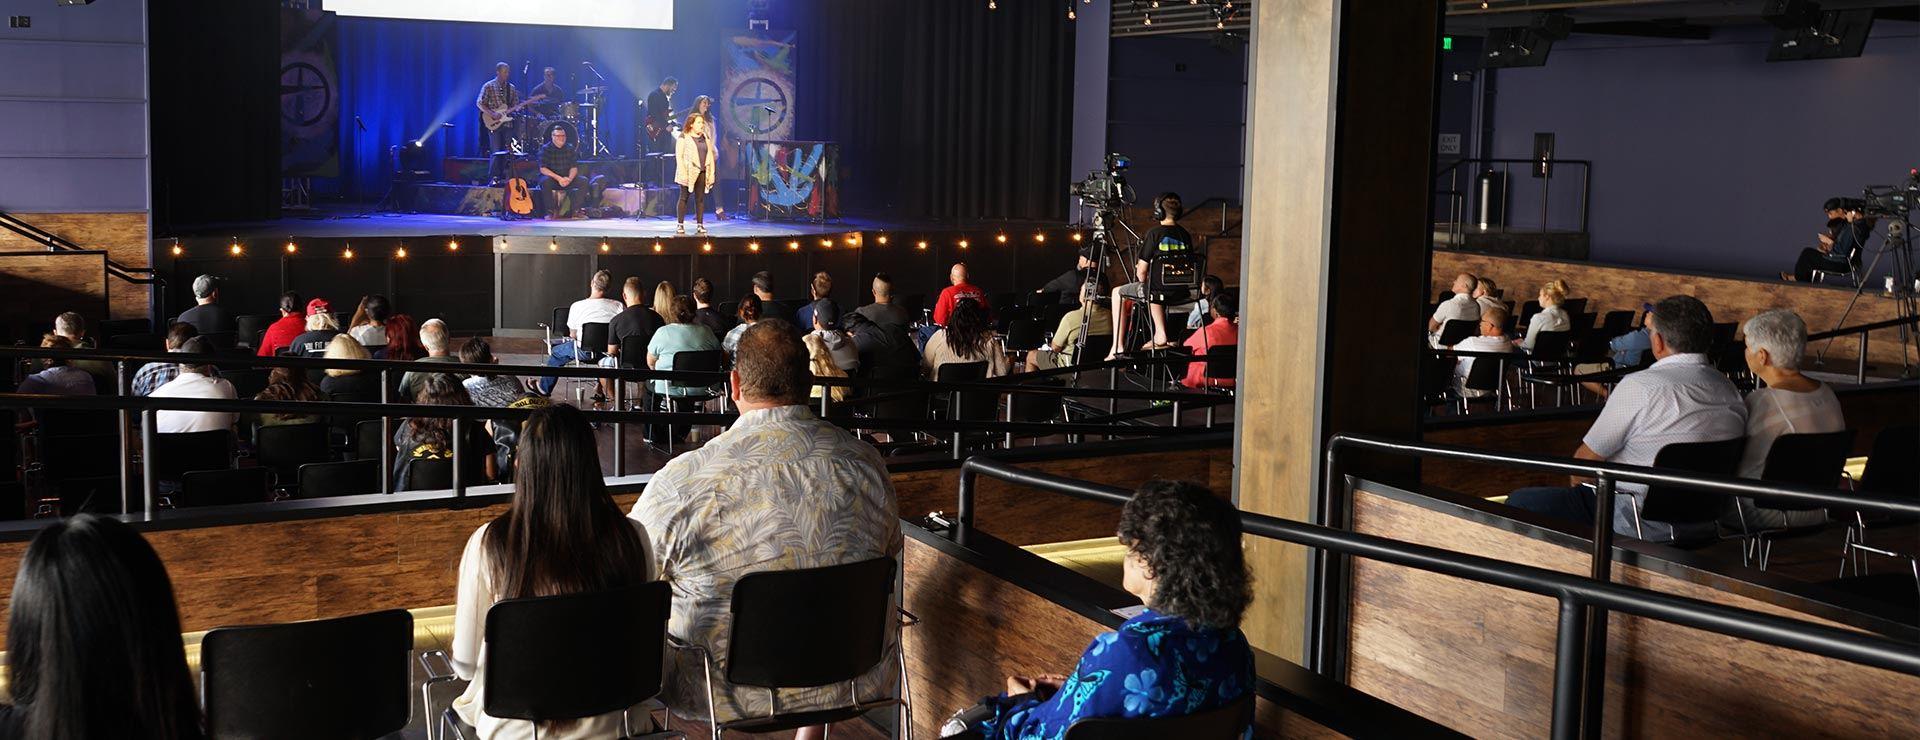 Indoor Church Service in Costa Mesa